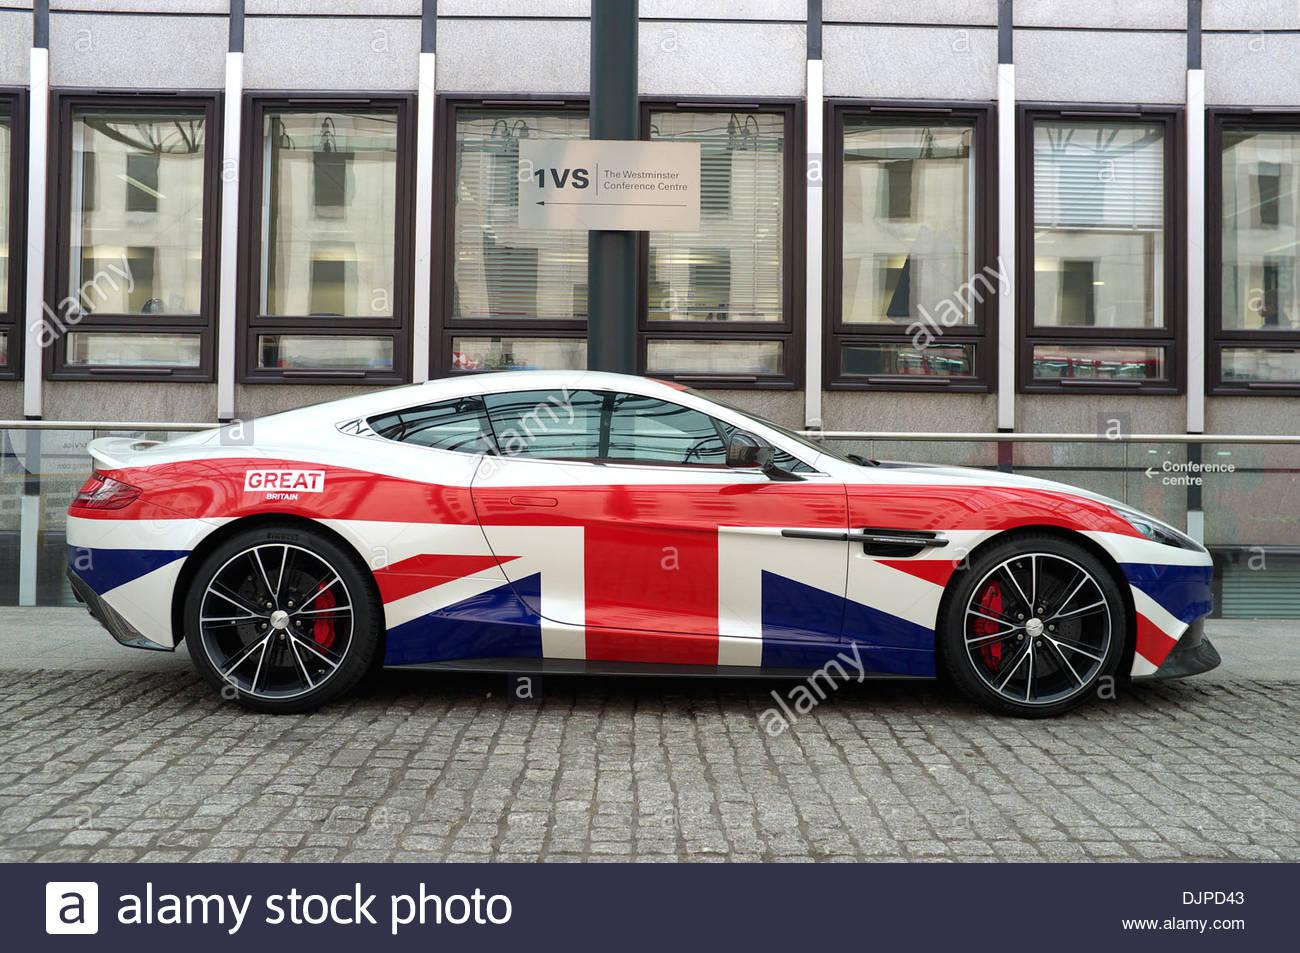 British Sports Car Manufactured In Great Britain Uk Stock Photos